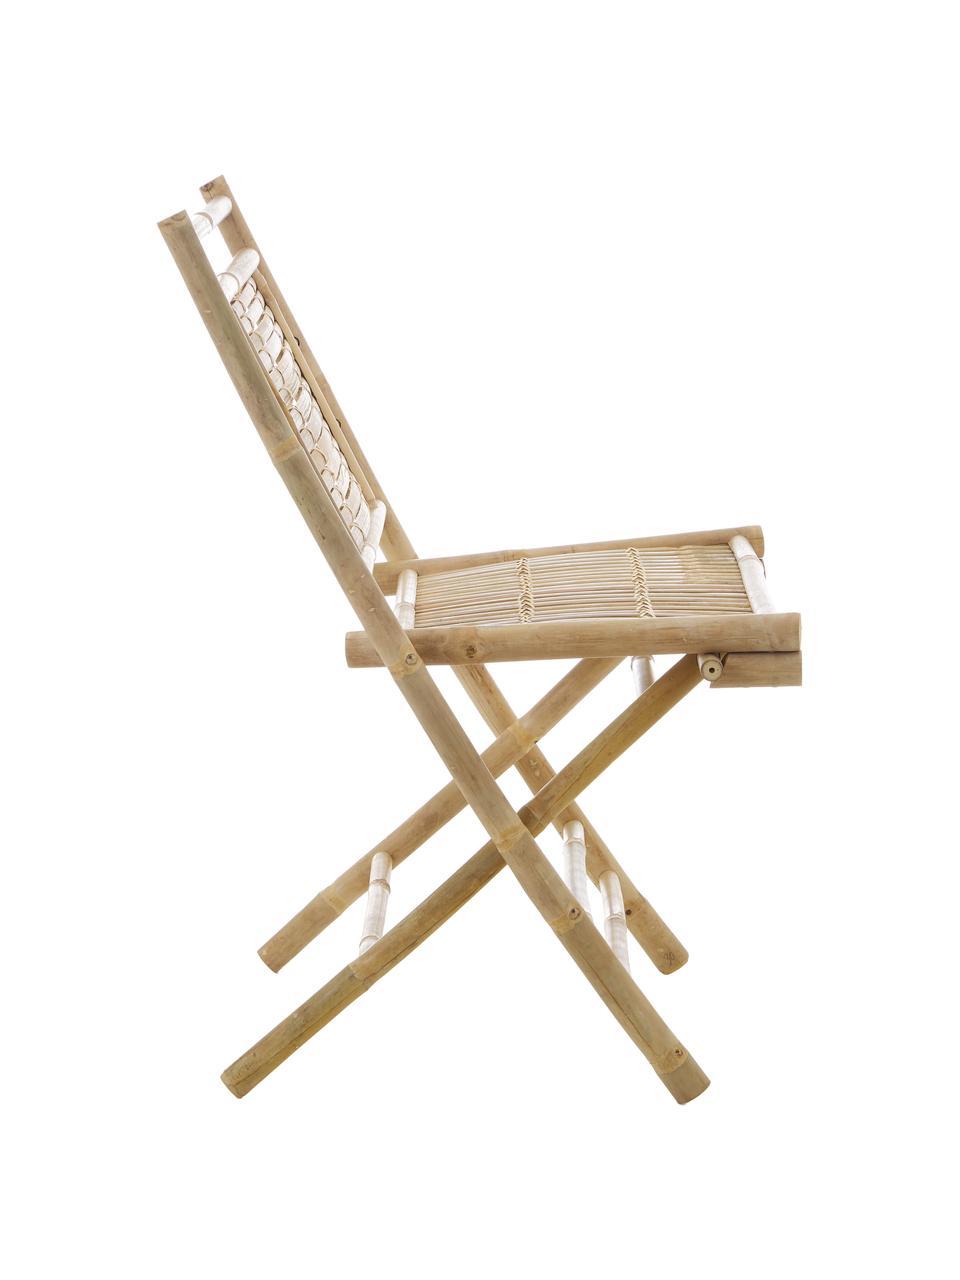 Zahradní skládací židle z bambusu Tropical, 2 ks, Hnědá